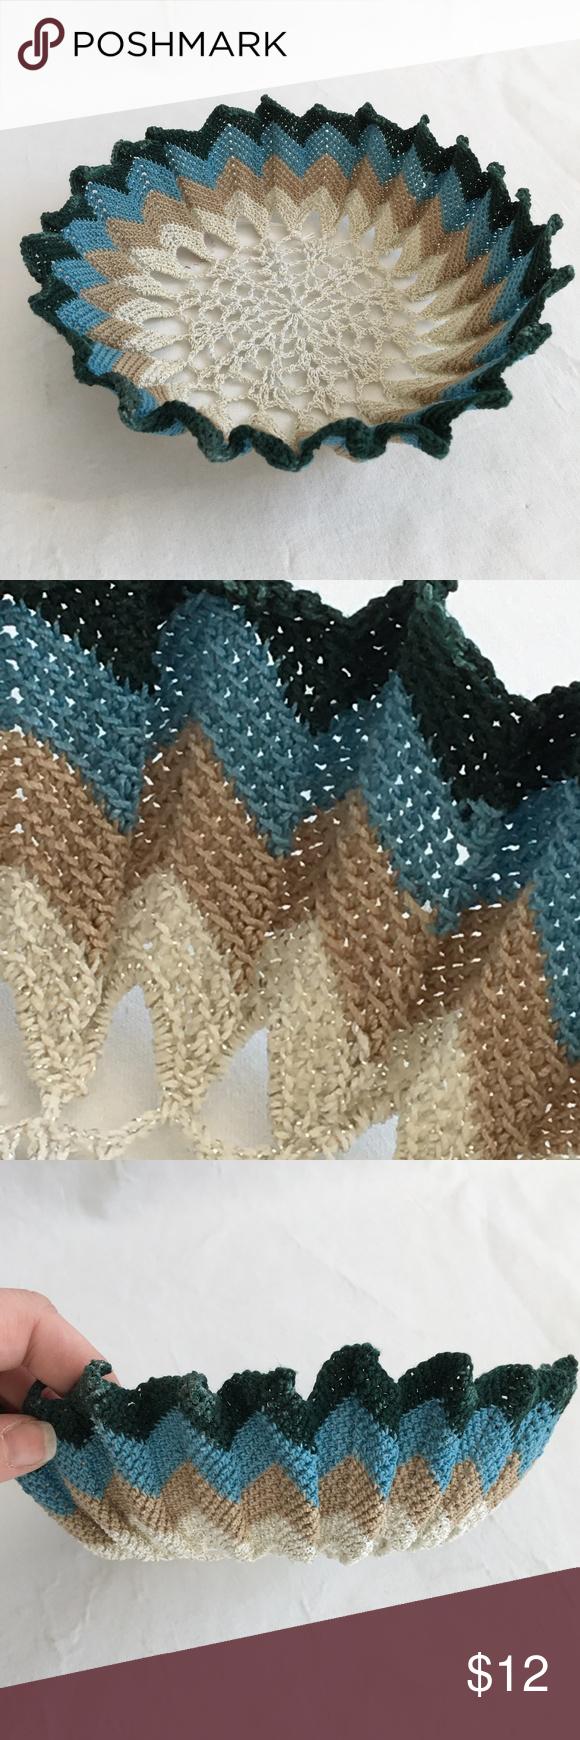 Medium Ripple Chevron Crochet Bowl Medium Ripple Chevron Crochet Bowl Handmade.  Made out of 100% cotton and measures 2 1/2 high and has a diameter of 8 1/2. Accents Baskets & Bins #crochetbowl